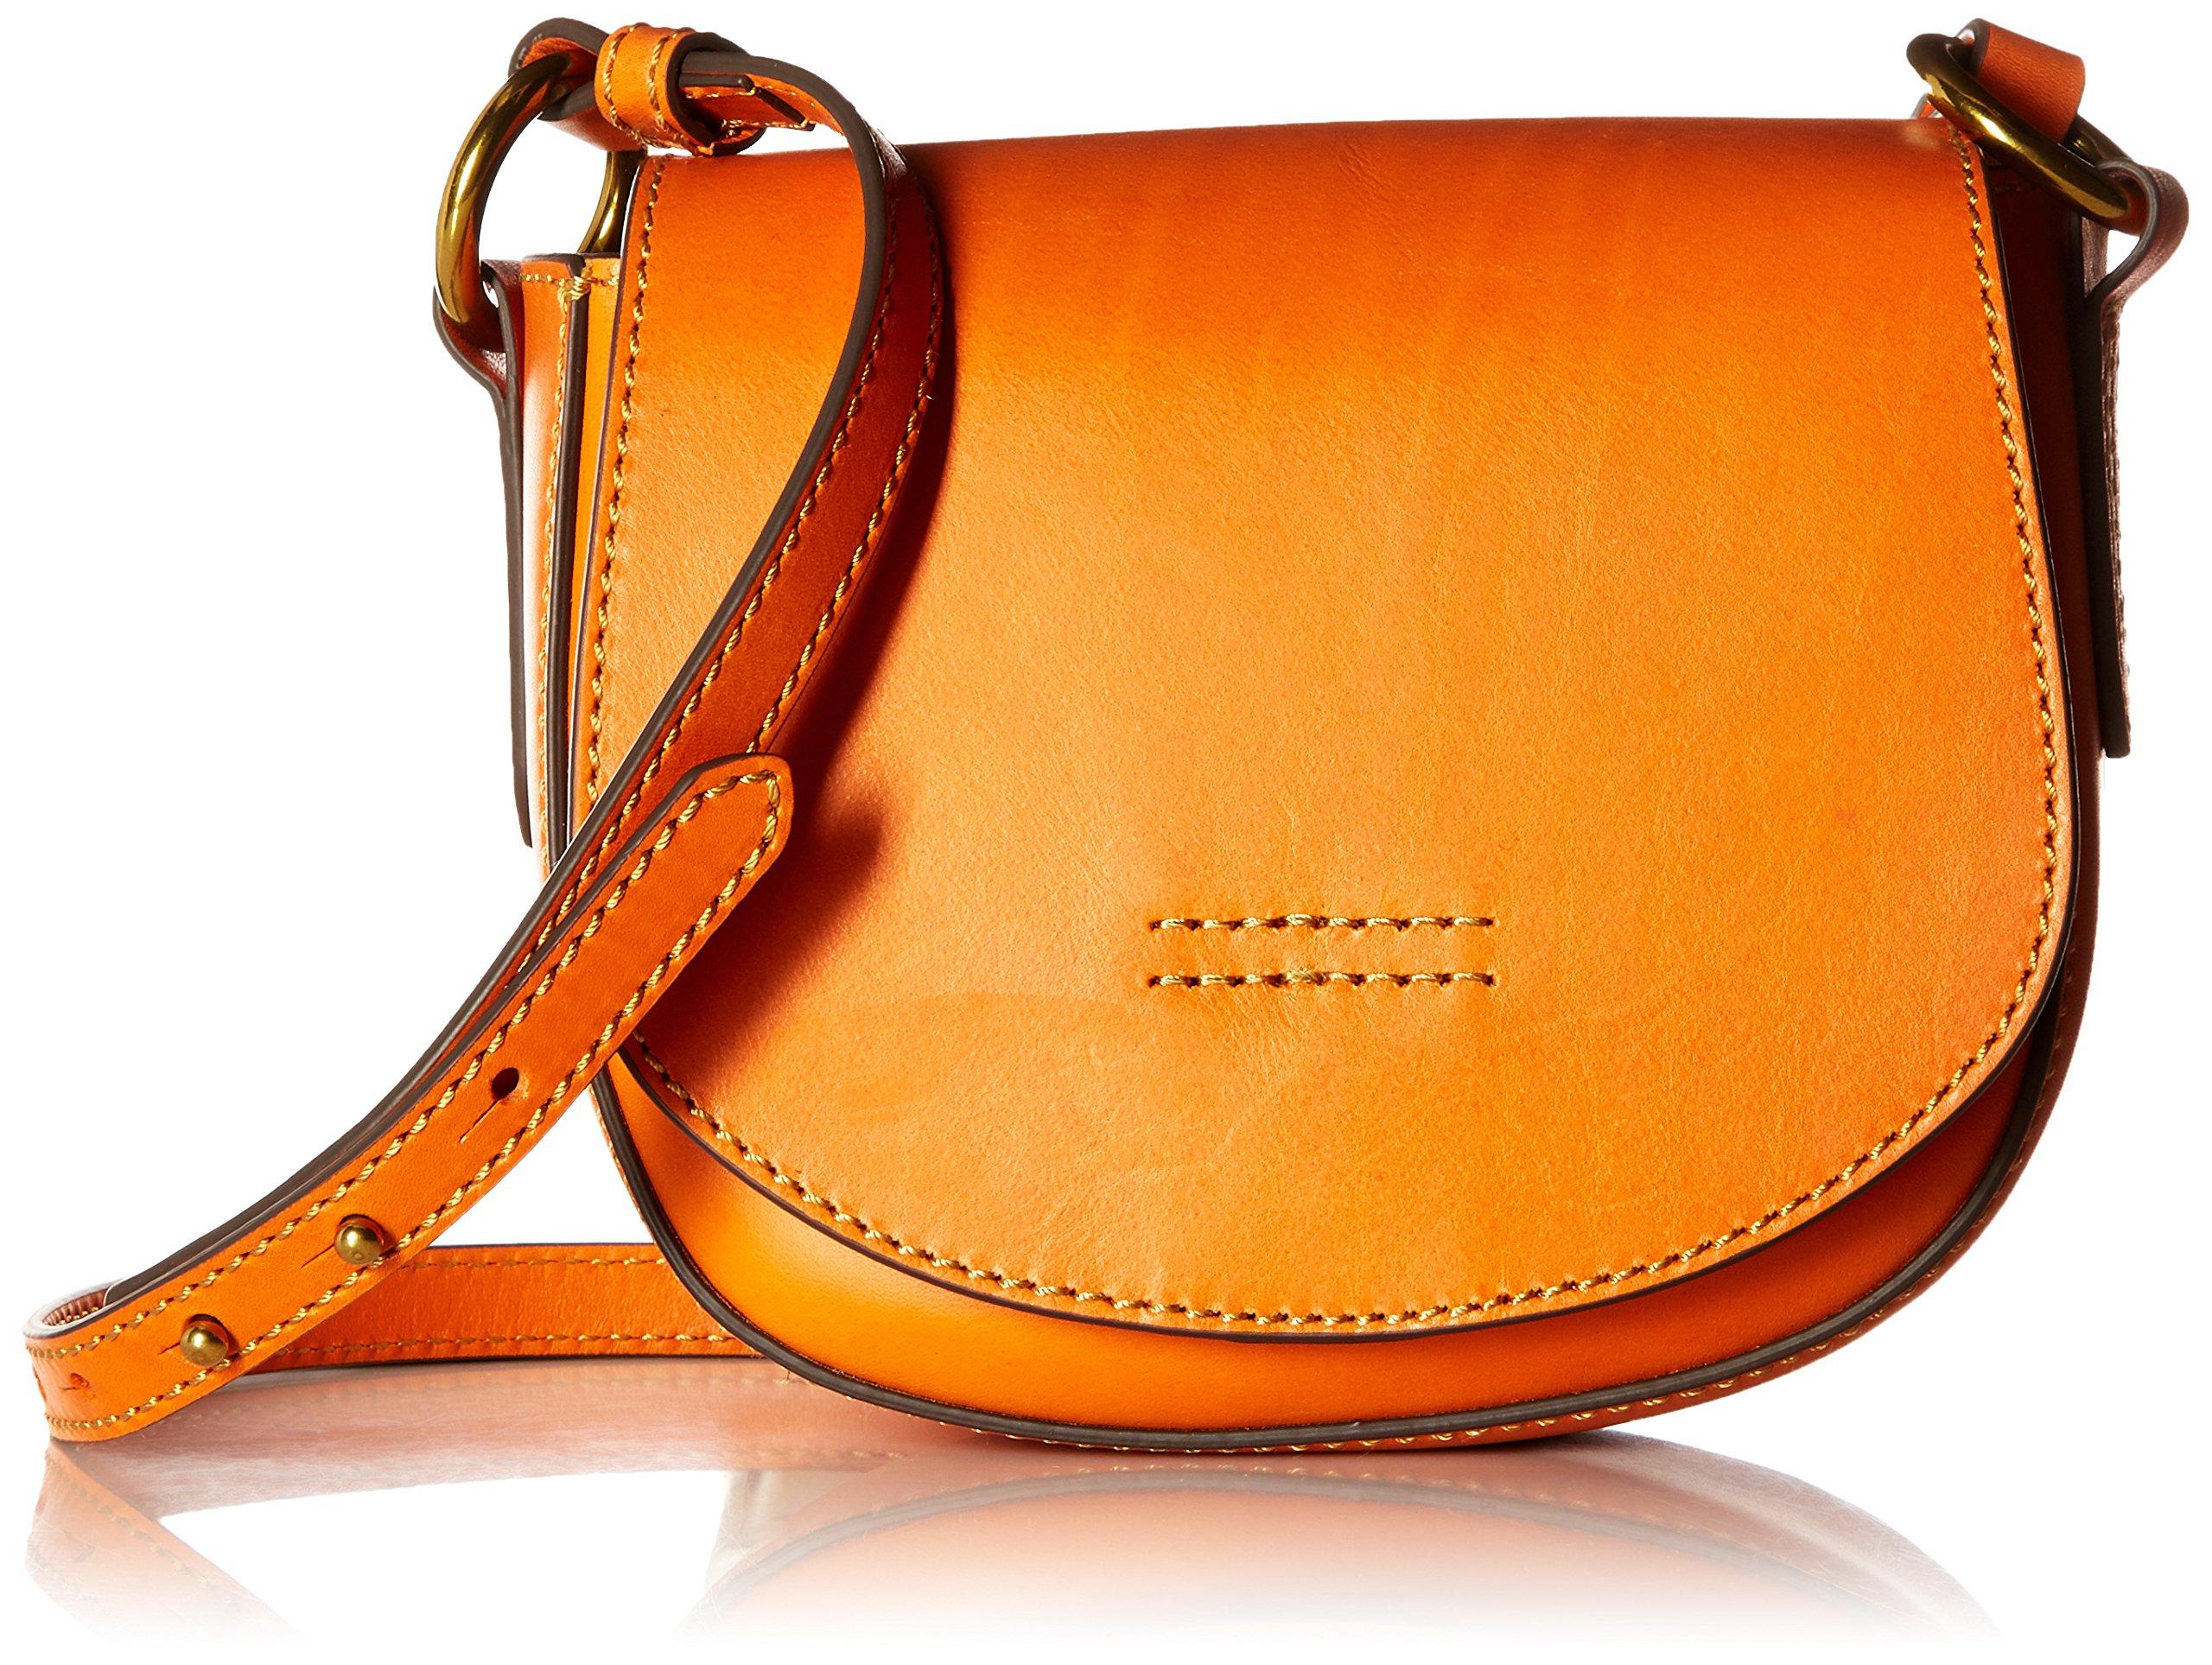 FRYE Harness Small Saddle, Orange